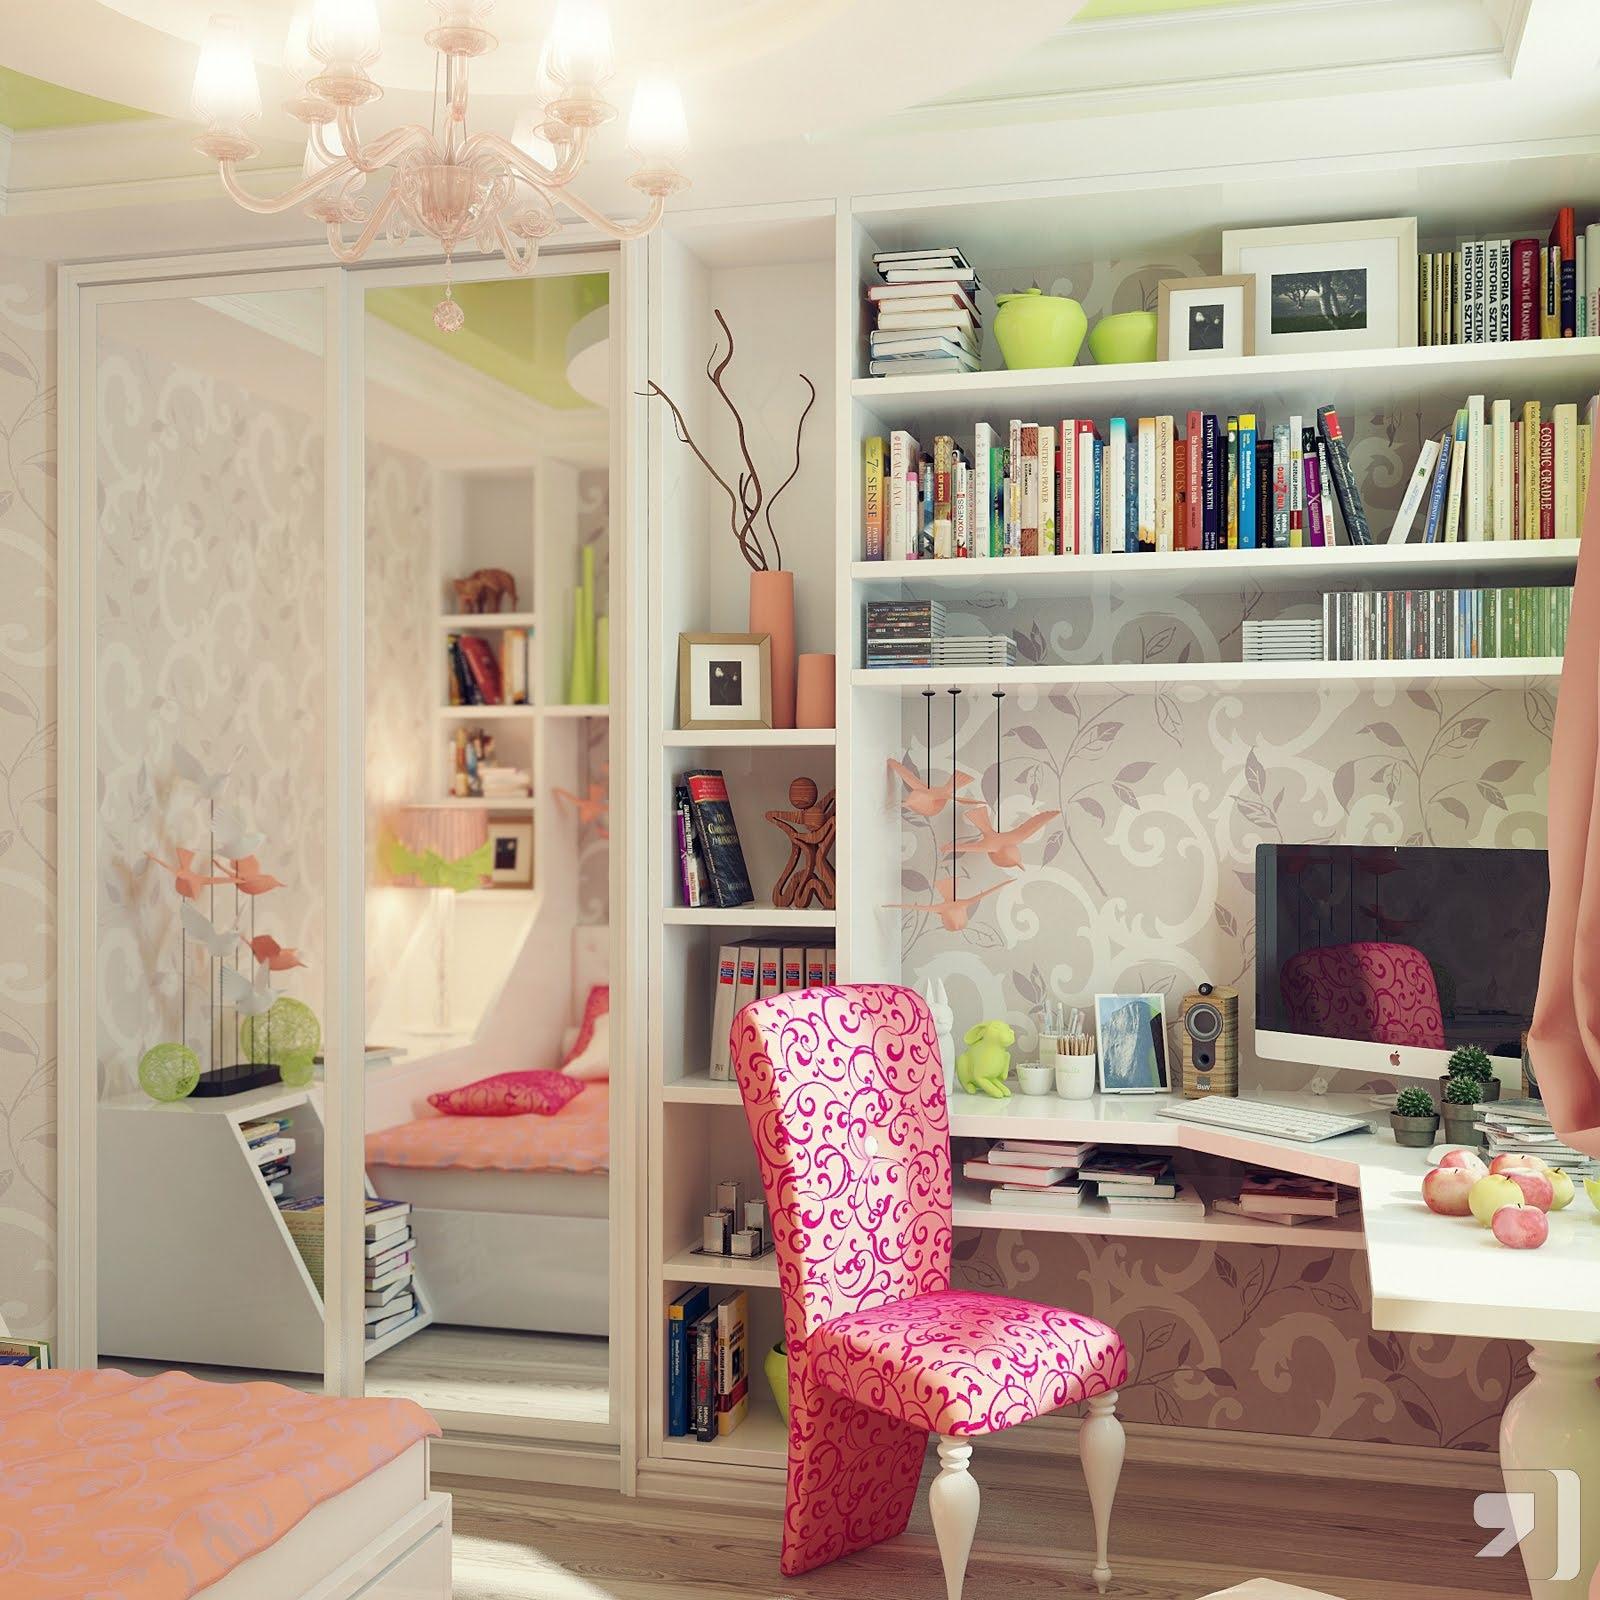 Интерьеры для девичьей комнаты